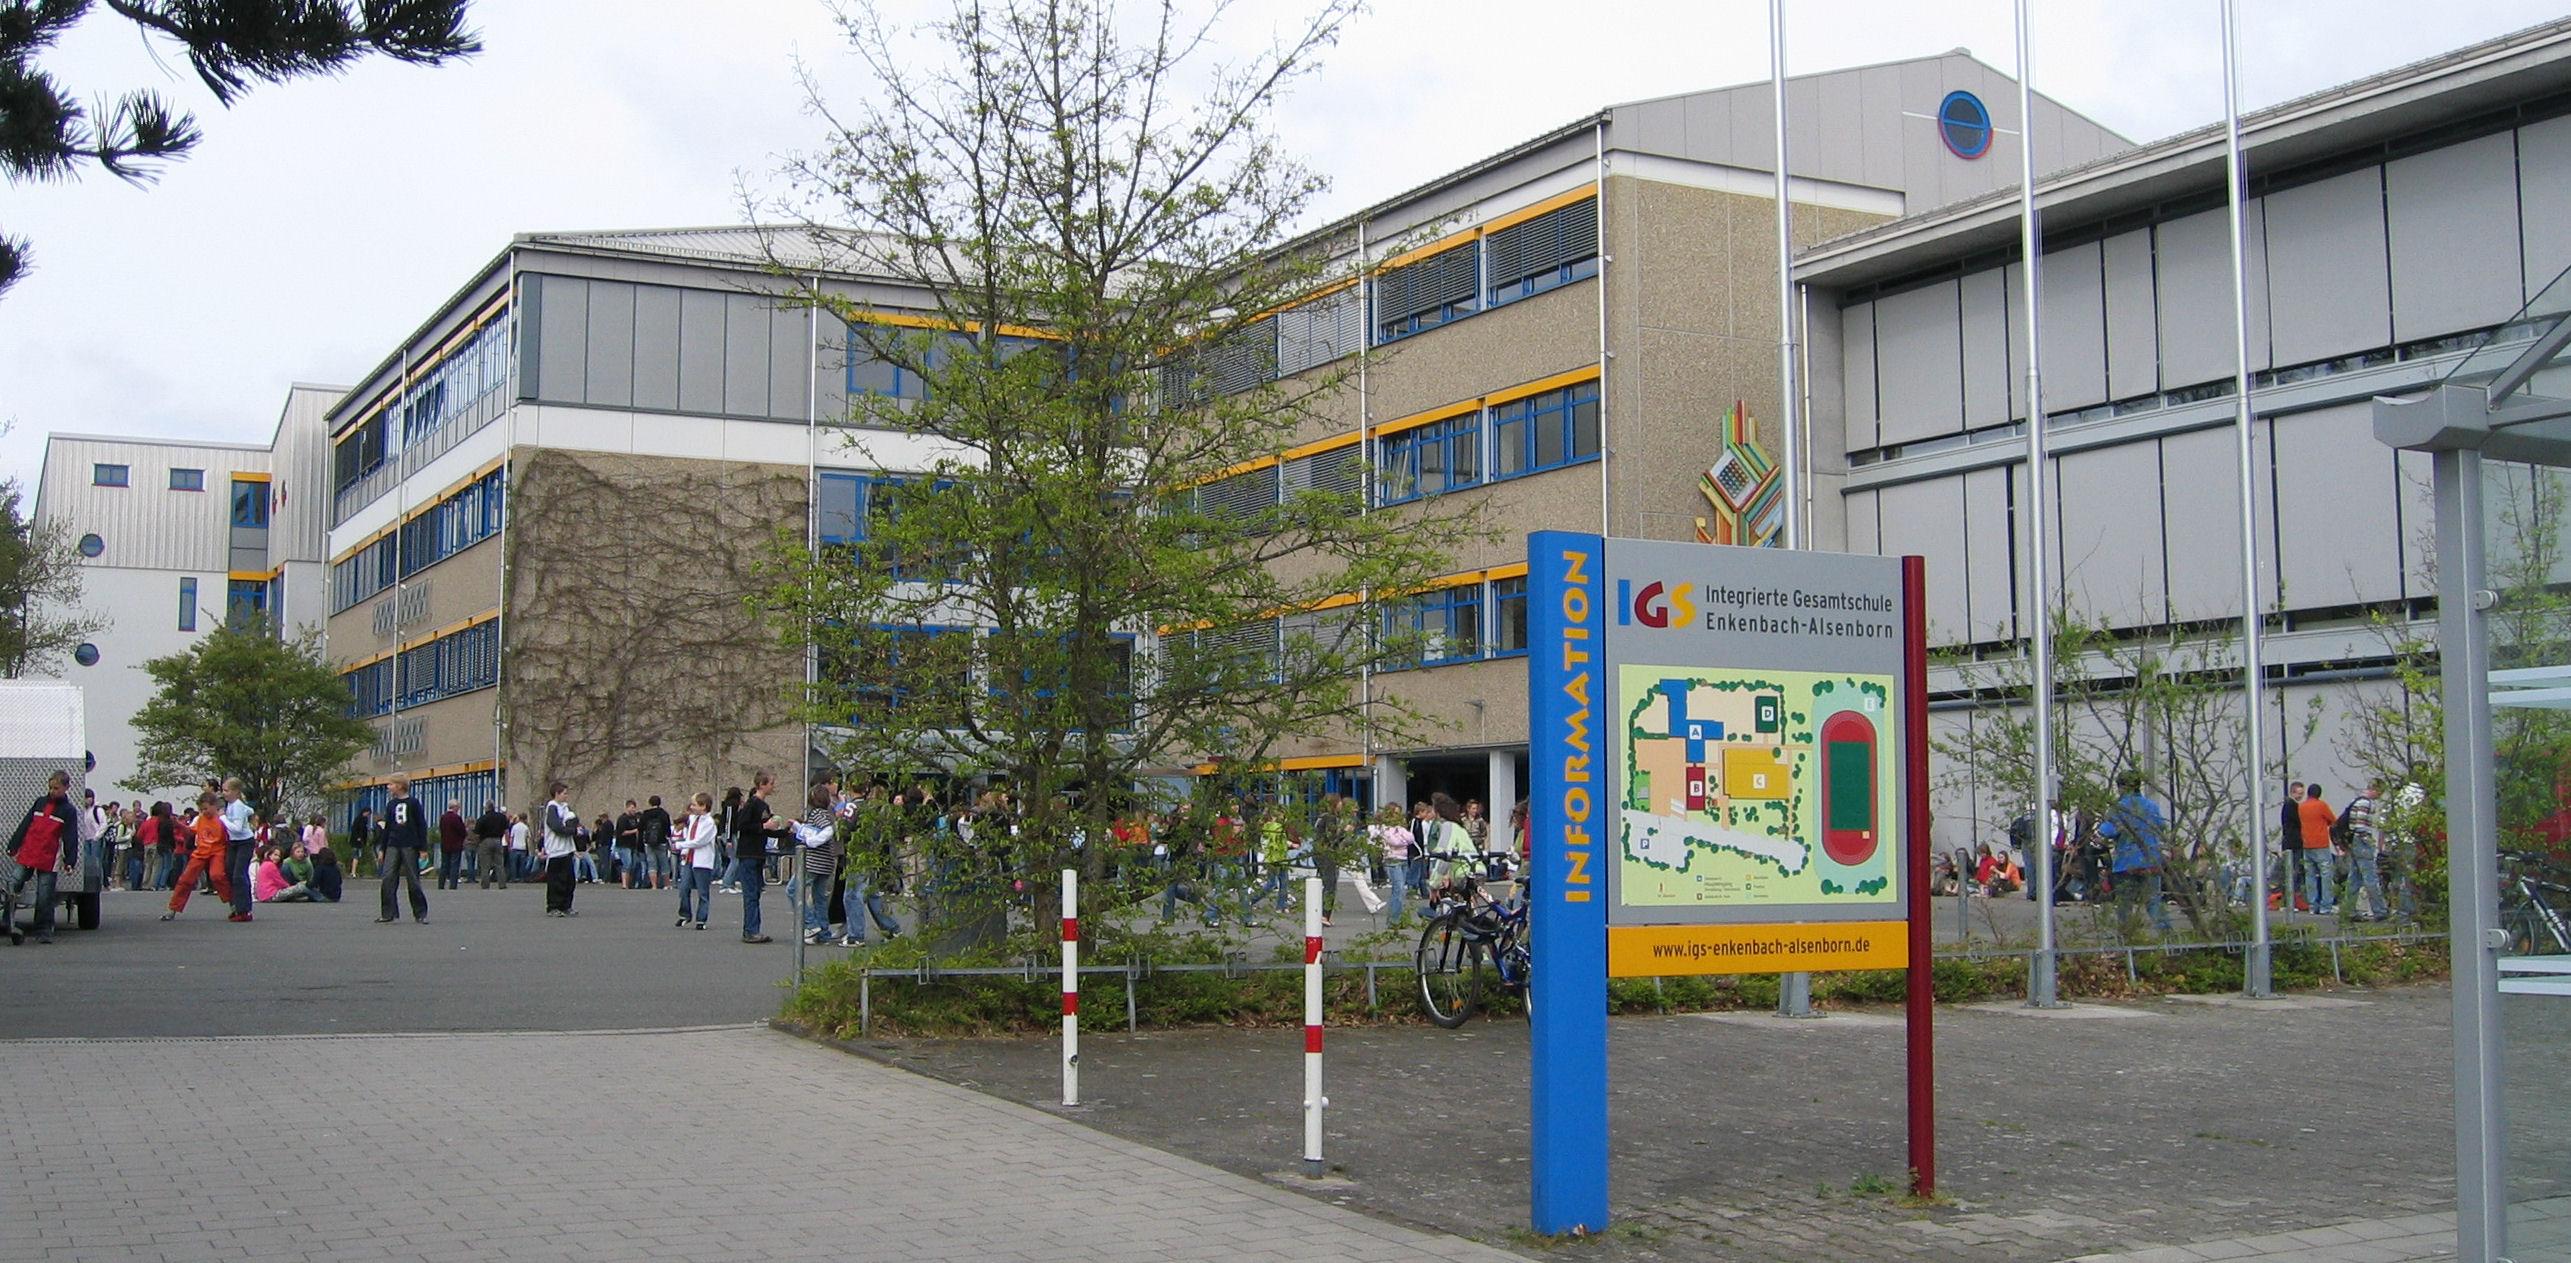 Igs Enkenbach Alsenborn